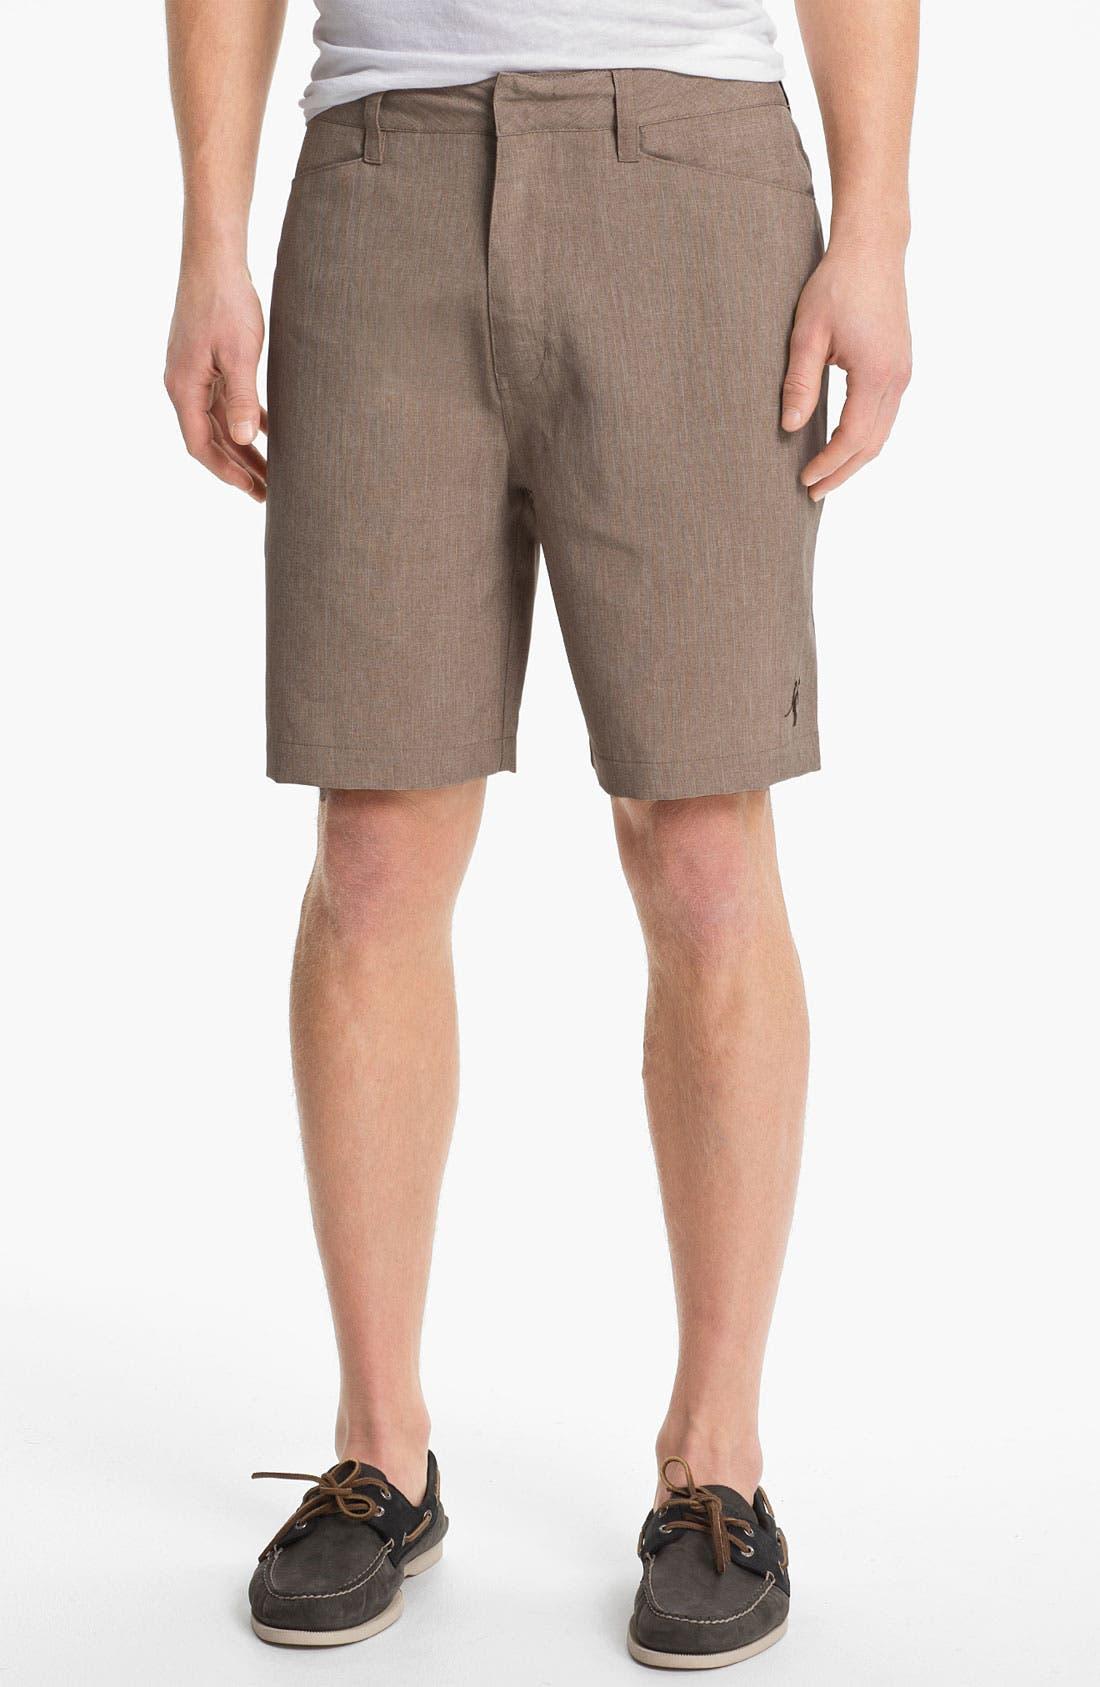 Main Image - Toes on the Nose 'Rocker' Khaki Shorts